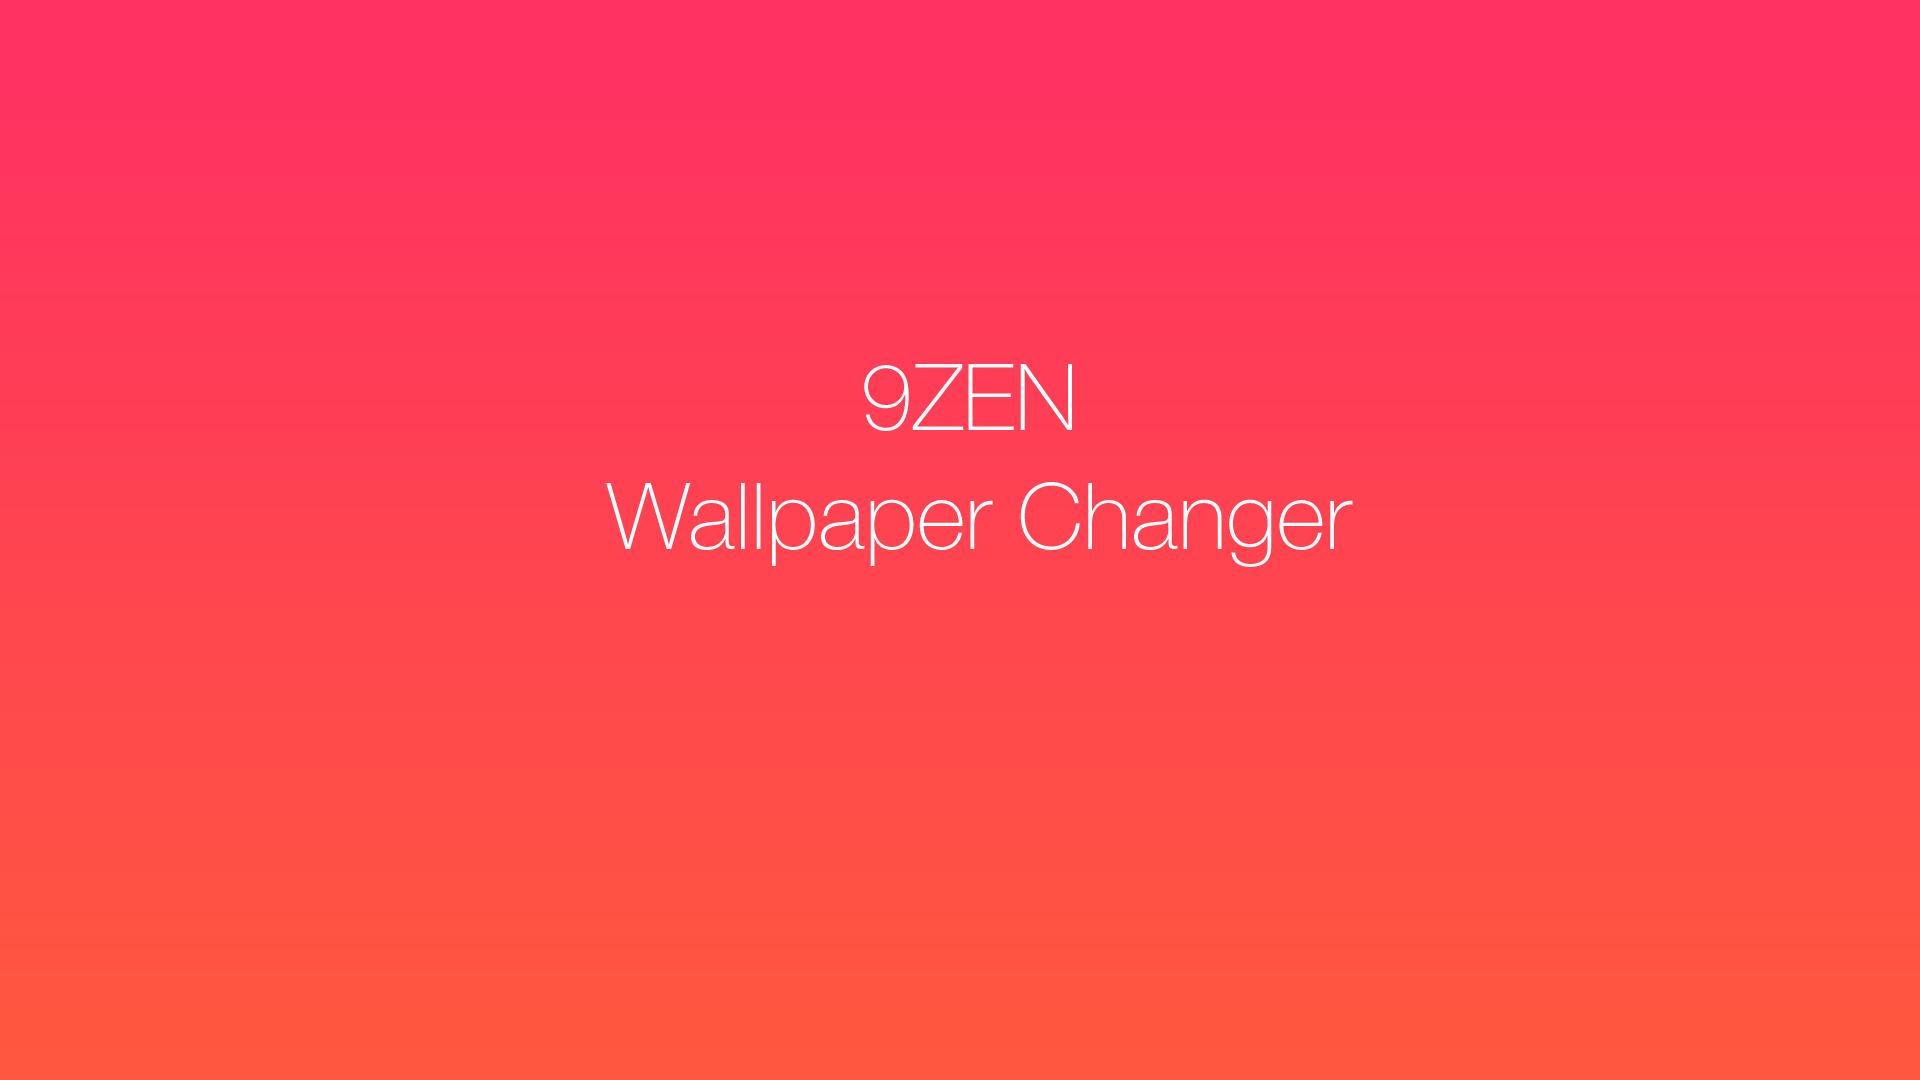 Get 9zen Wallpaper Changer Microsoft Store